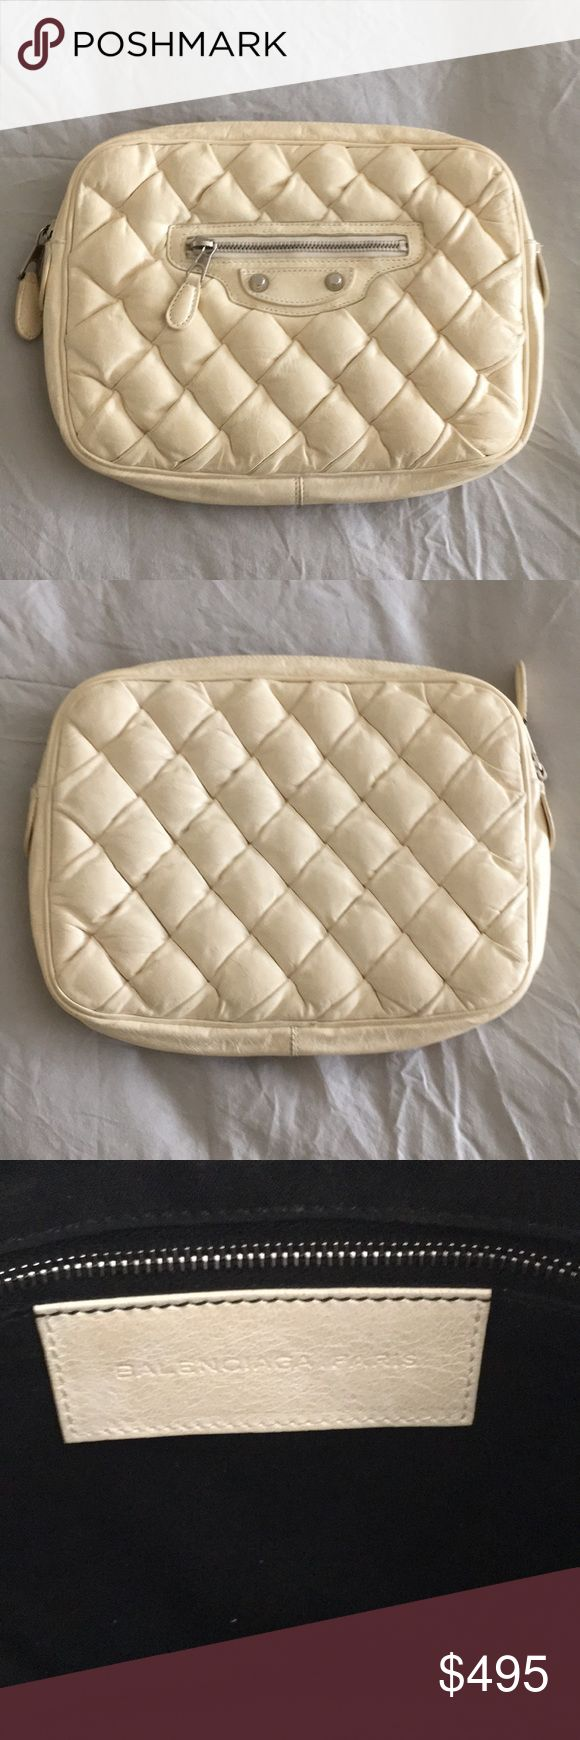 BALENCIAGA Chèvre Quilted Matelasse Clutch 100% Authentic Balenciaga Clutch in Ivory. Balenciaga Bags Clutches & Wristlets